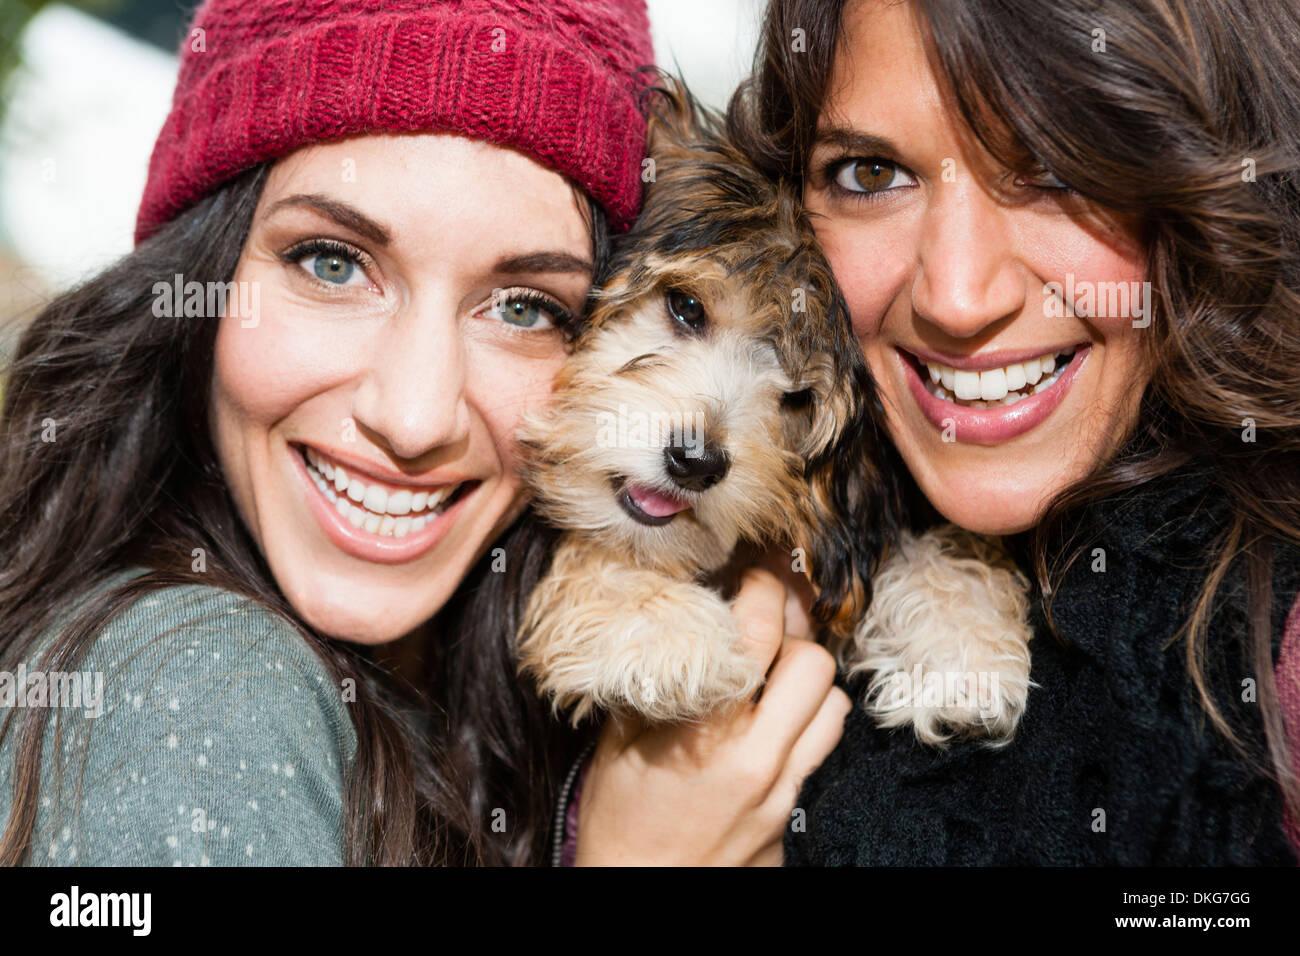 Amigos celebración perro mascota para fotografía Imagen De Stock